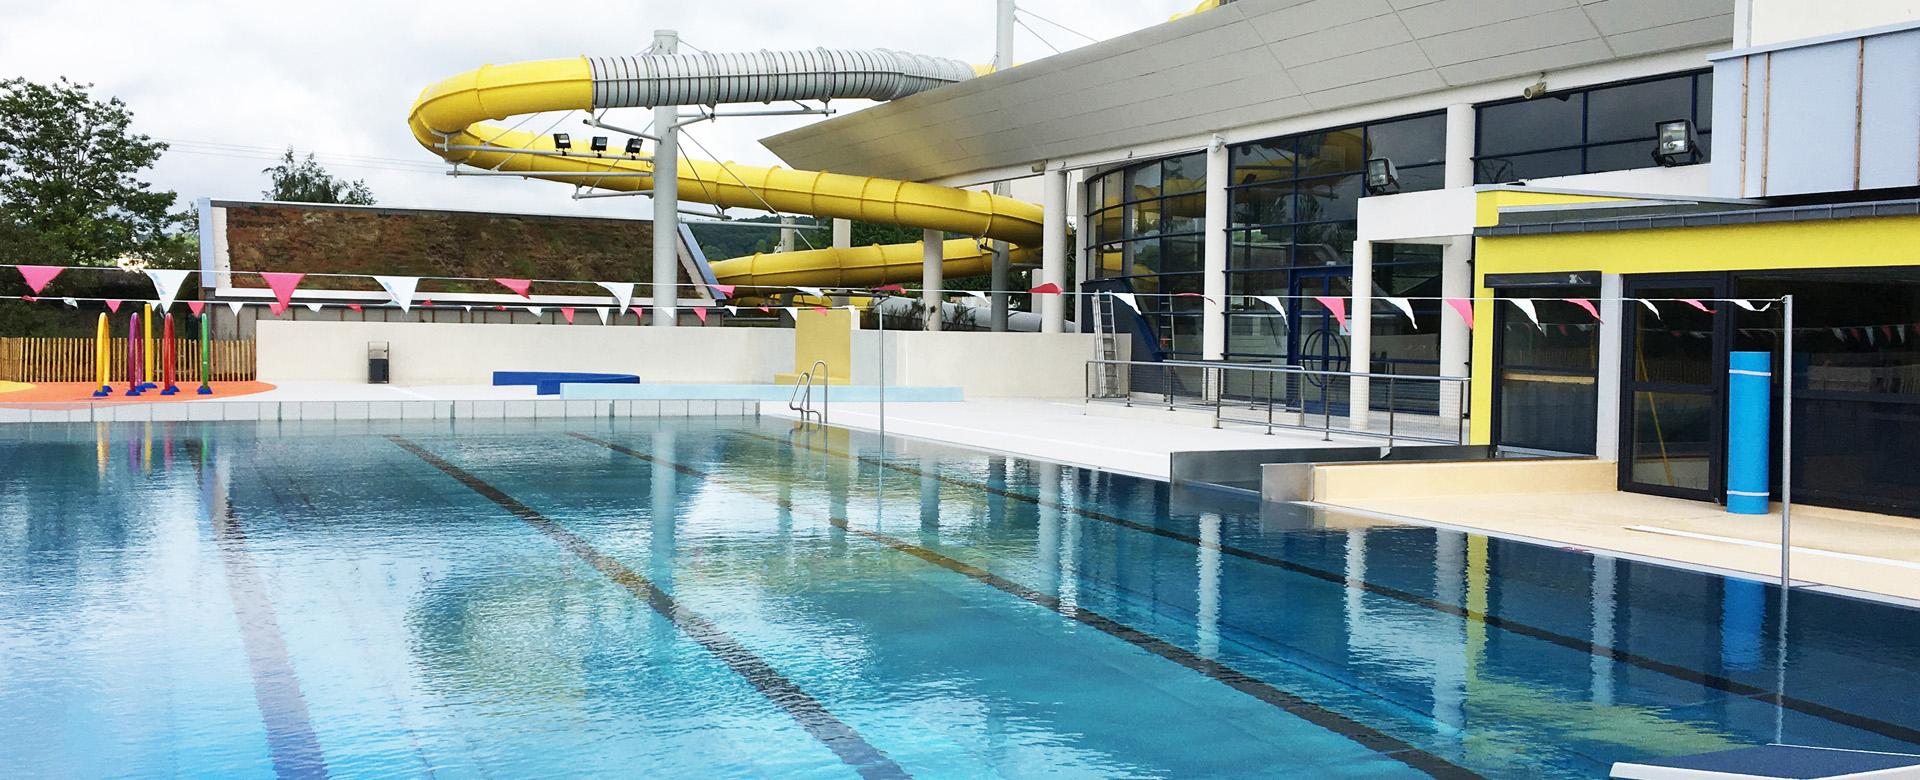 Centre Aquatique Aquaval - Agglo Seine-Eure tout Piscine Louviers Horaire